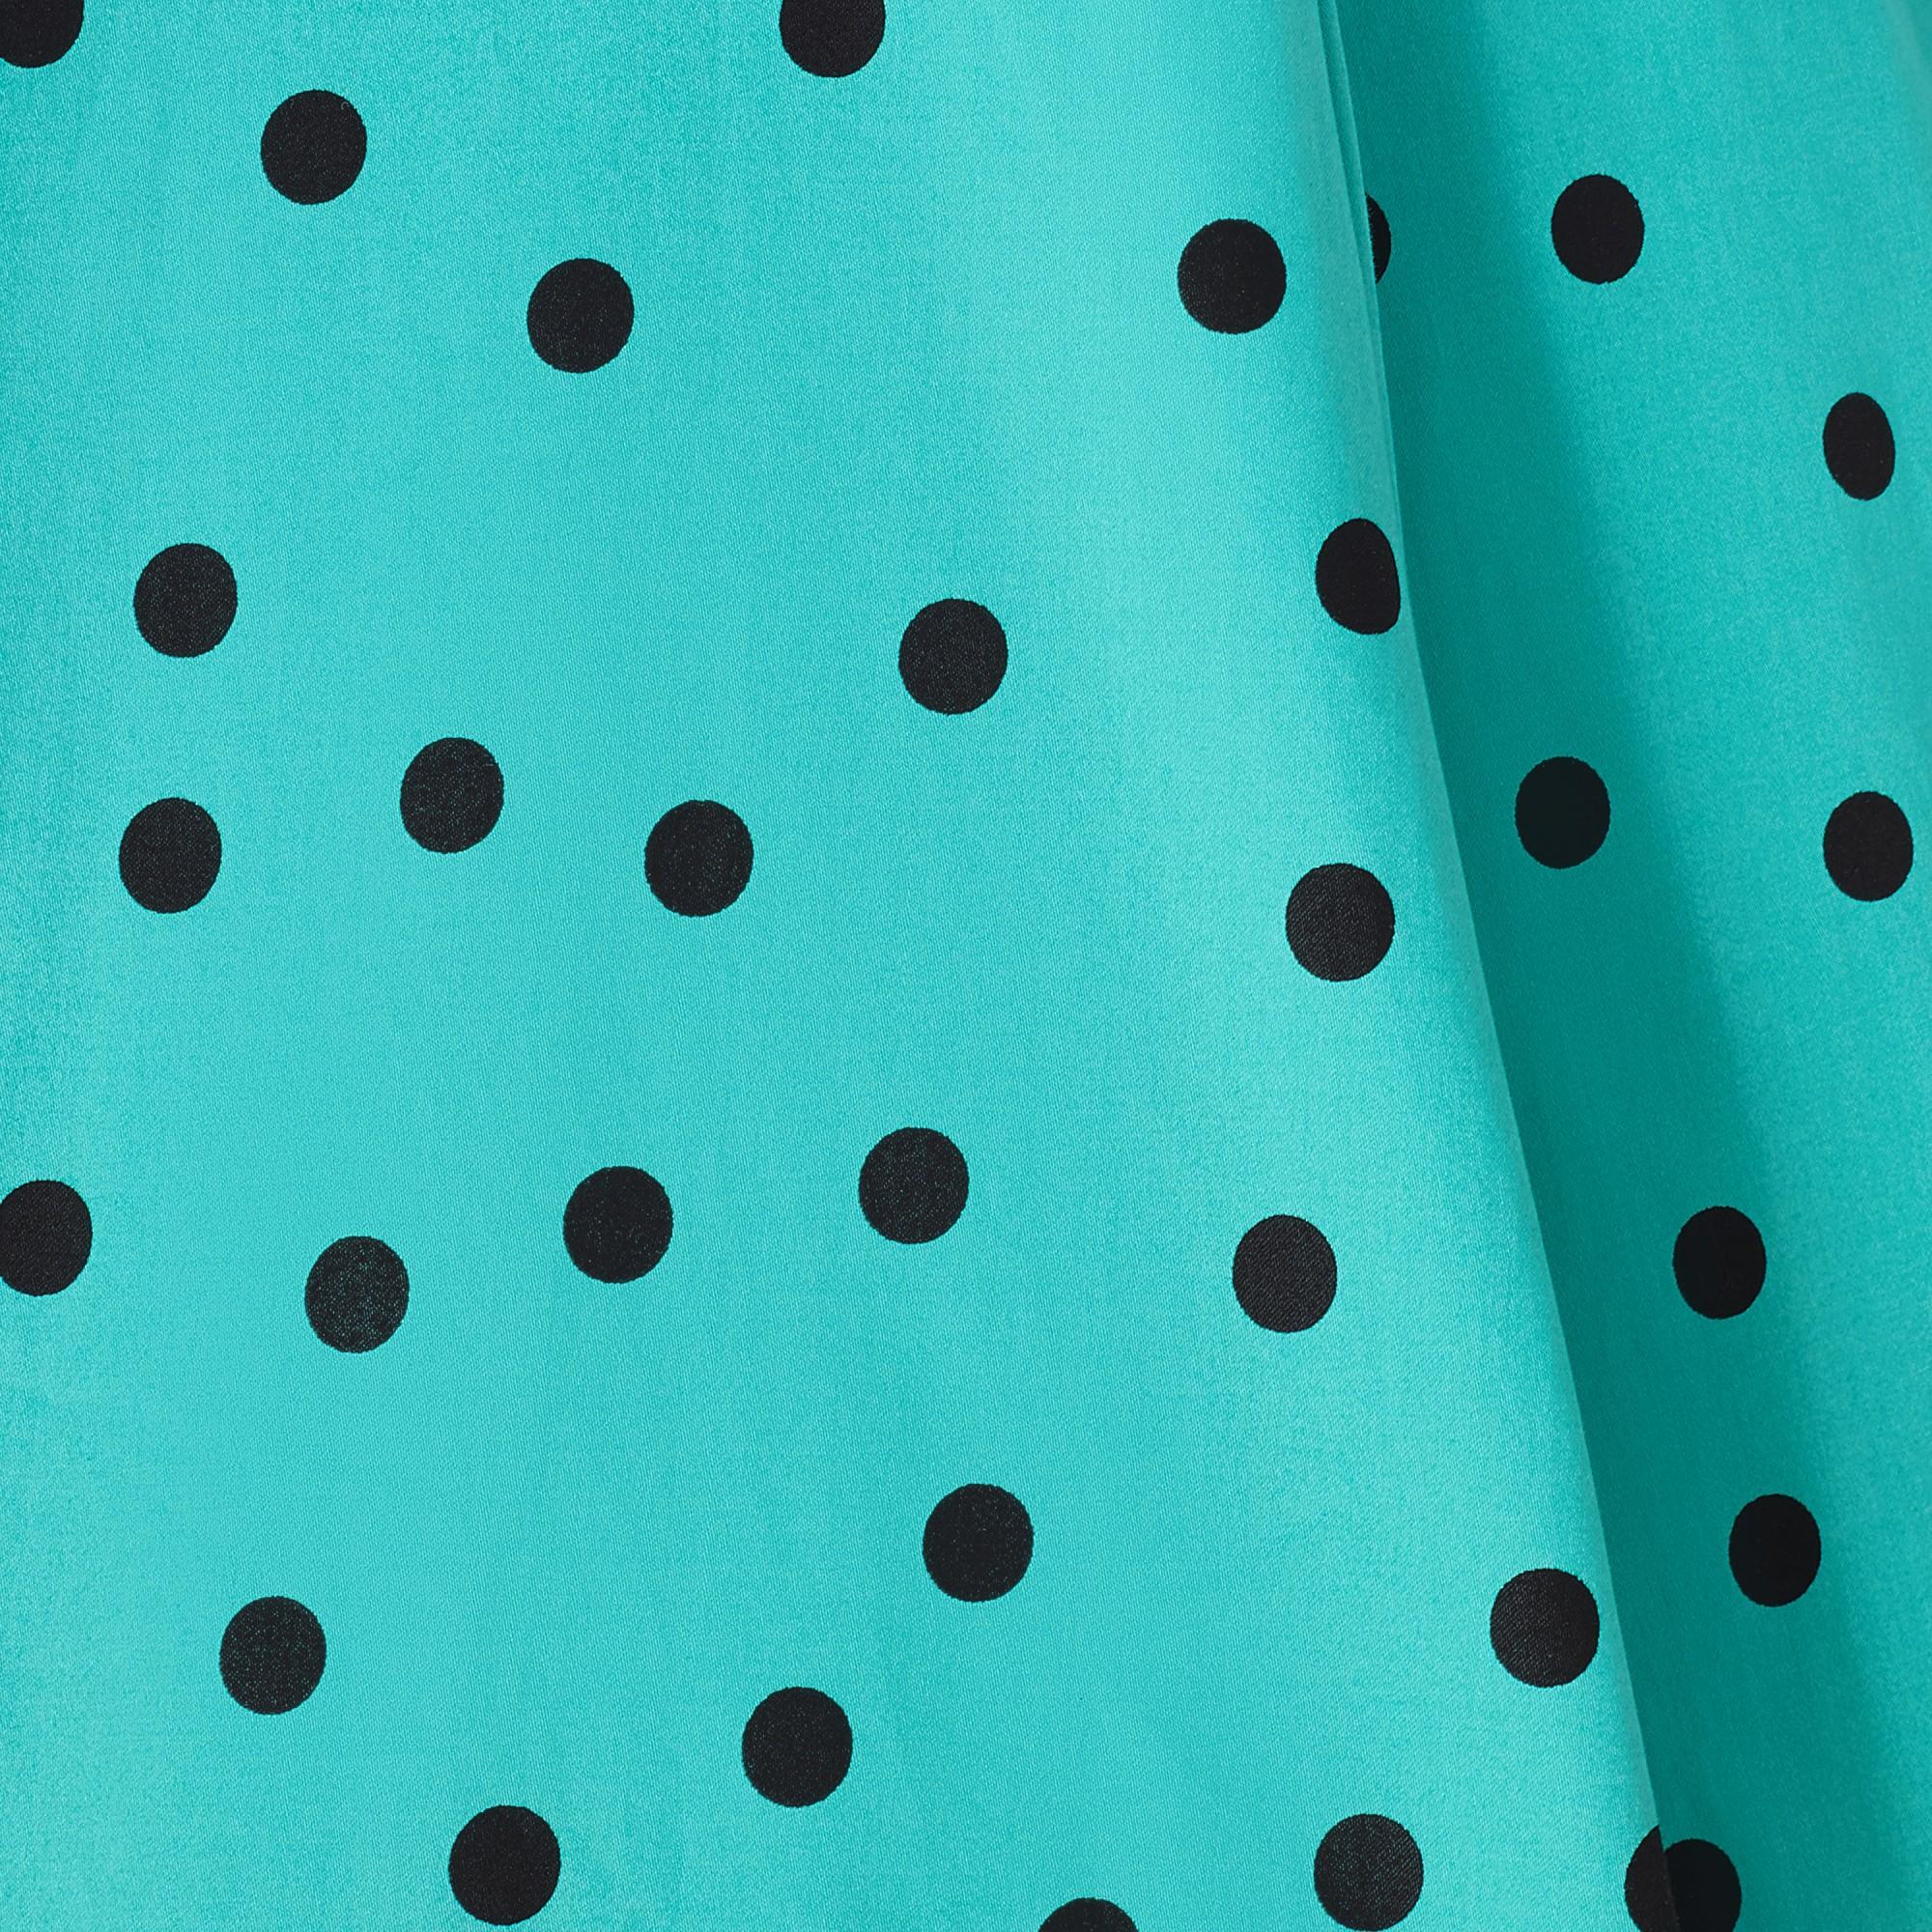 Amy Turquoise Polka Dot 1950s Style Dress 8